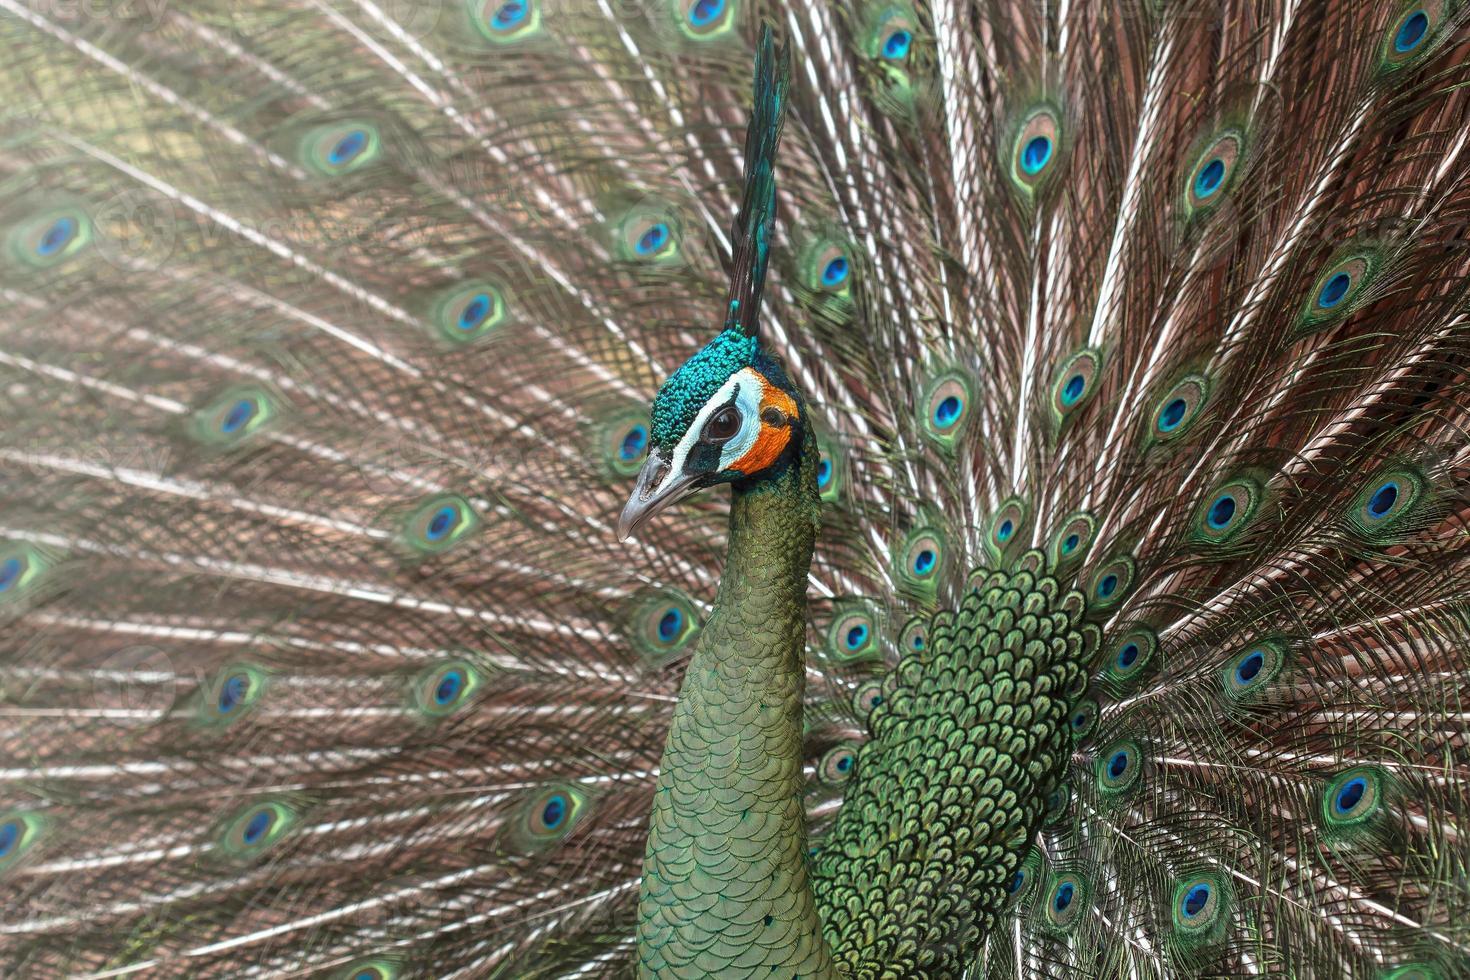 påfåglar i naturen, gröna påfåglar eller pavo muticus foto